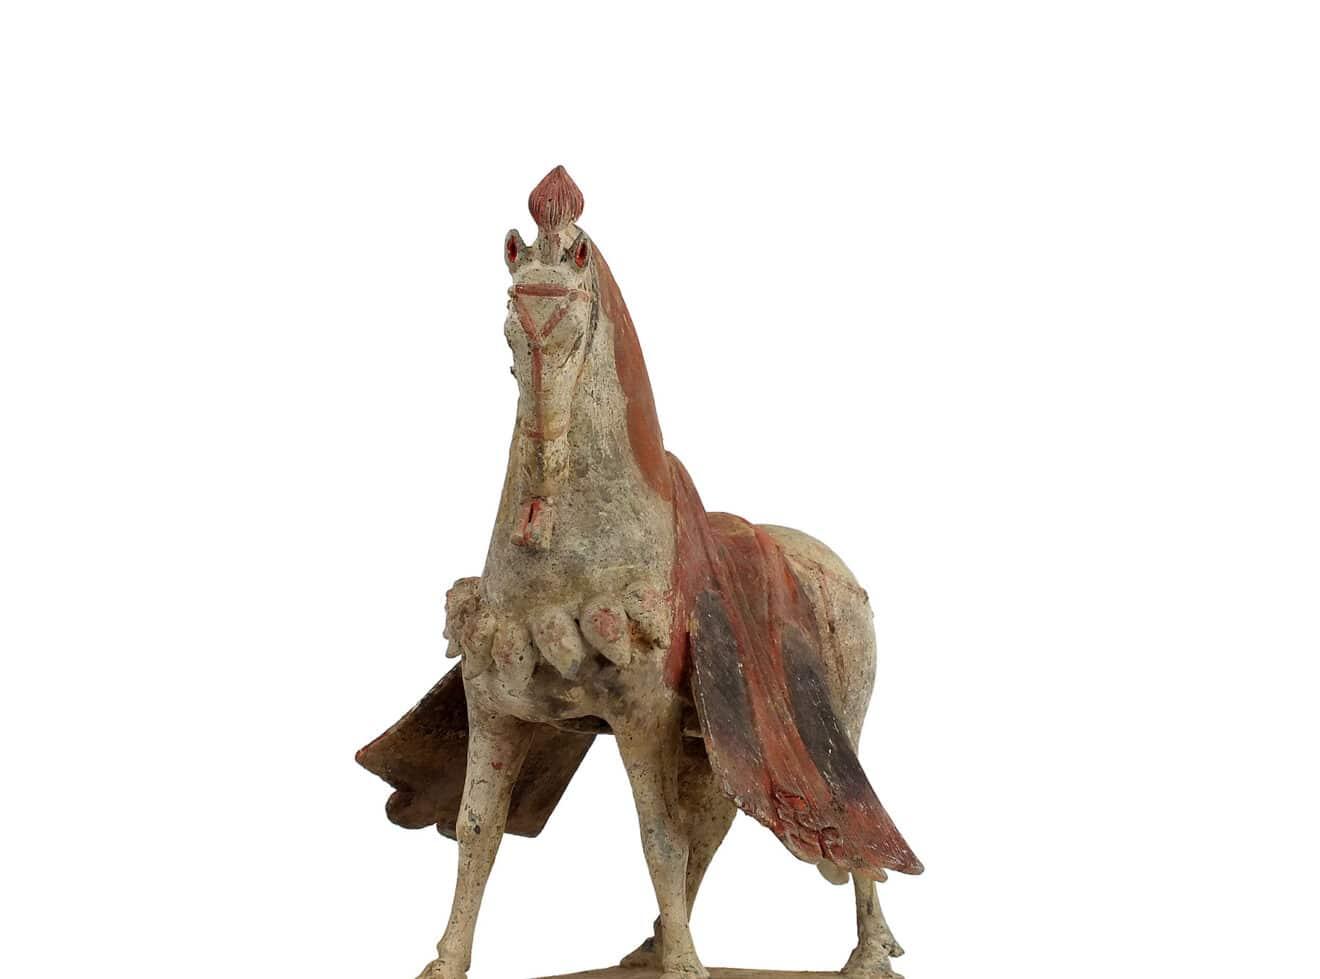 Magnificent Pottery Caparisoned Horse (13)